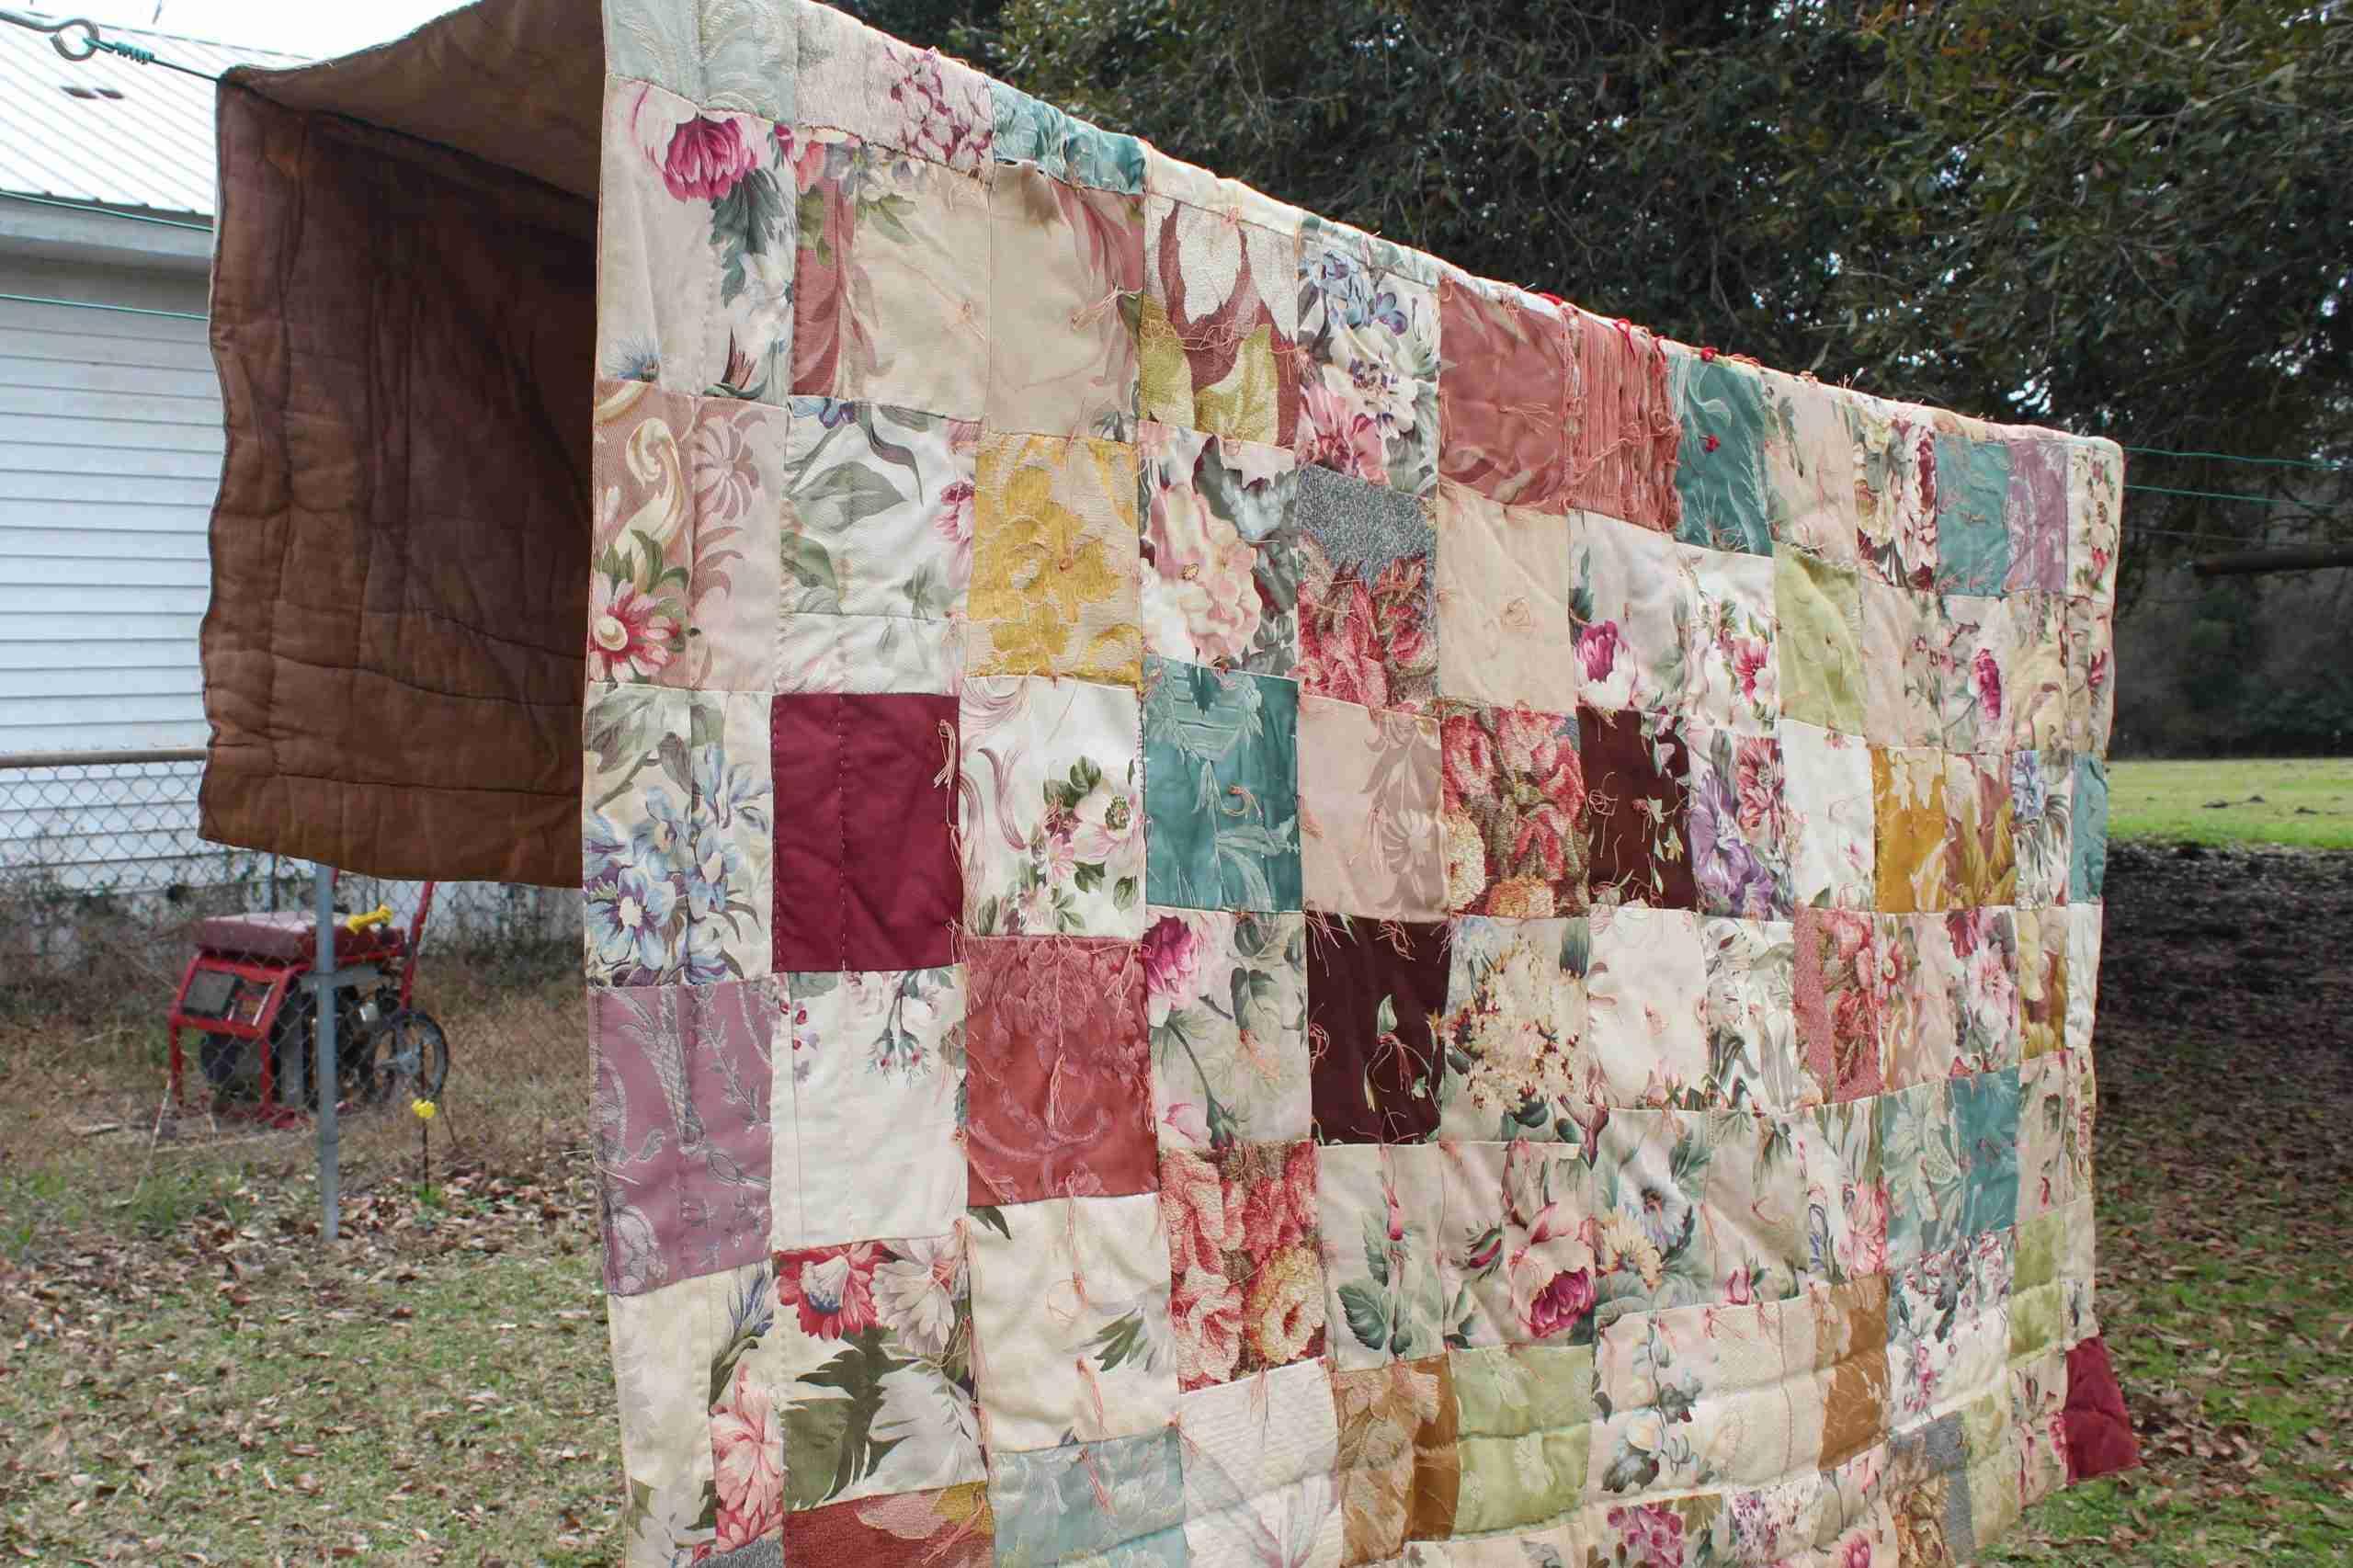 Quilt hanging on clothesline